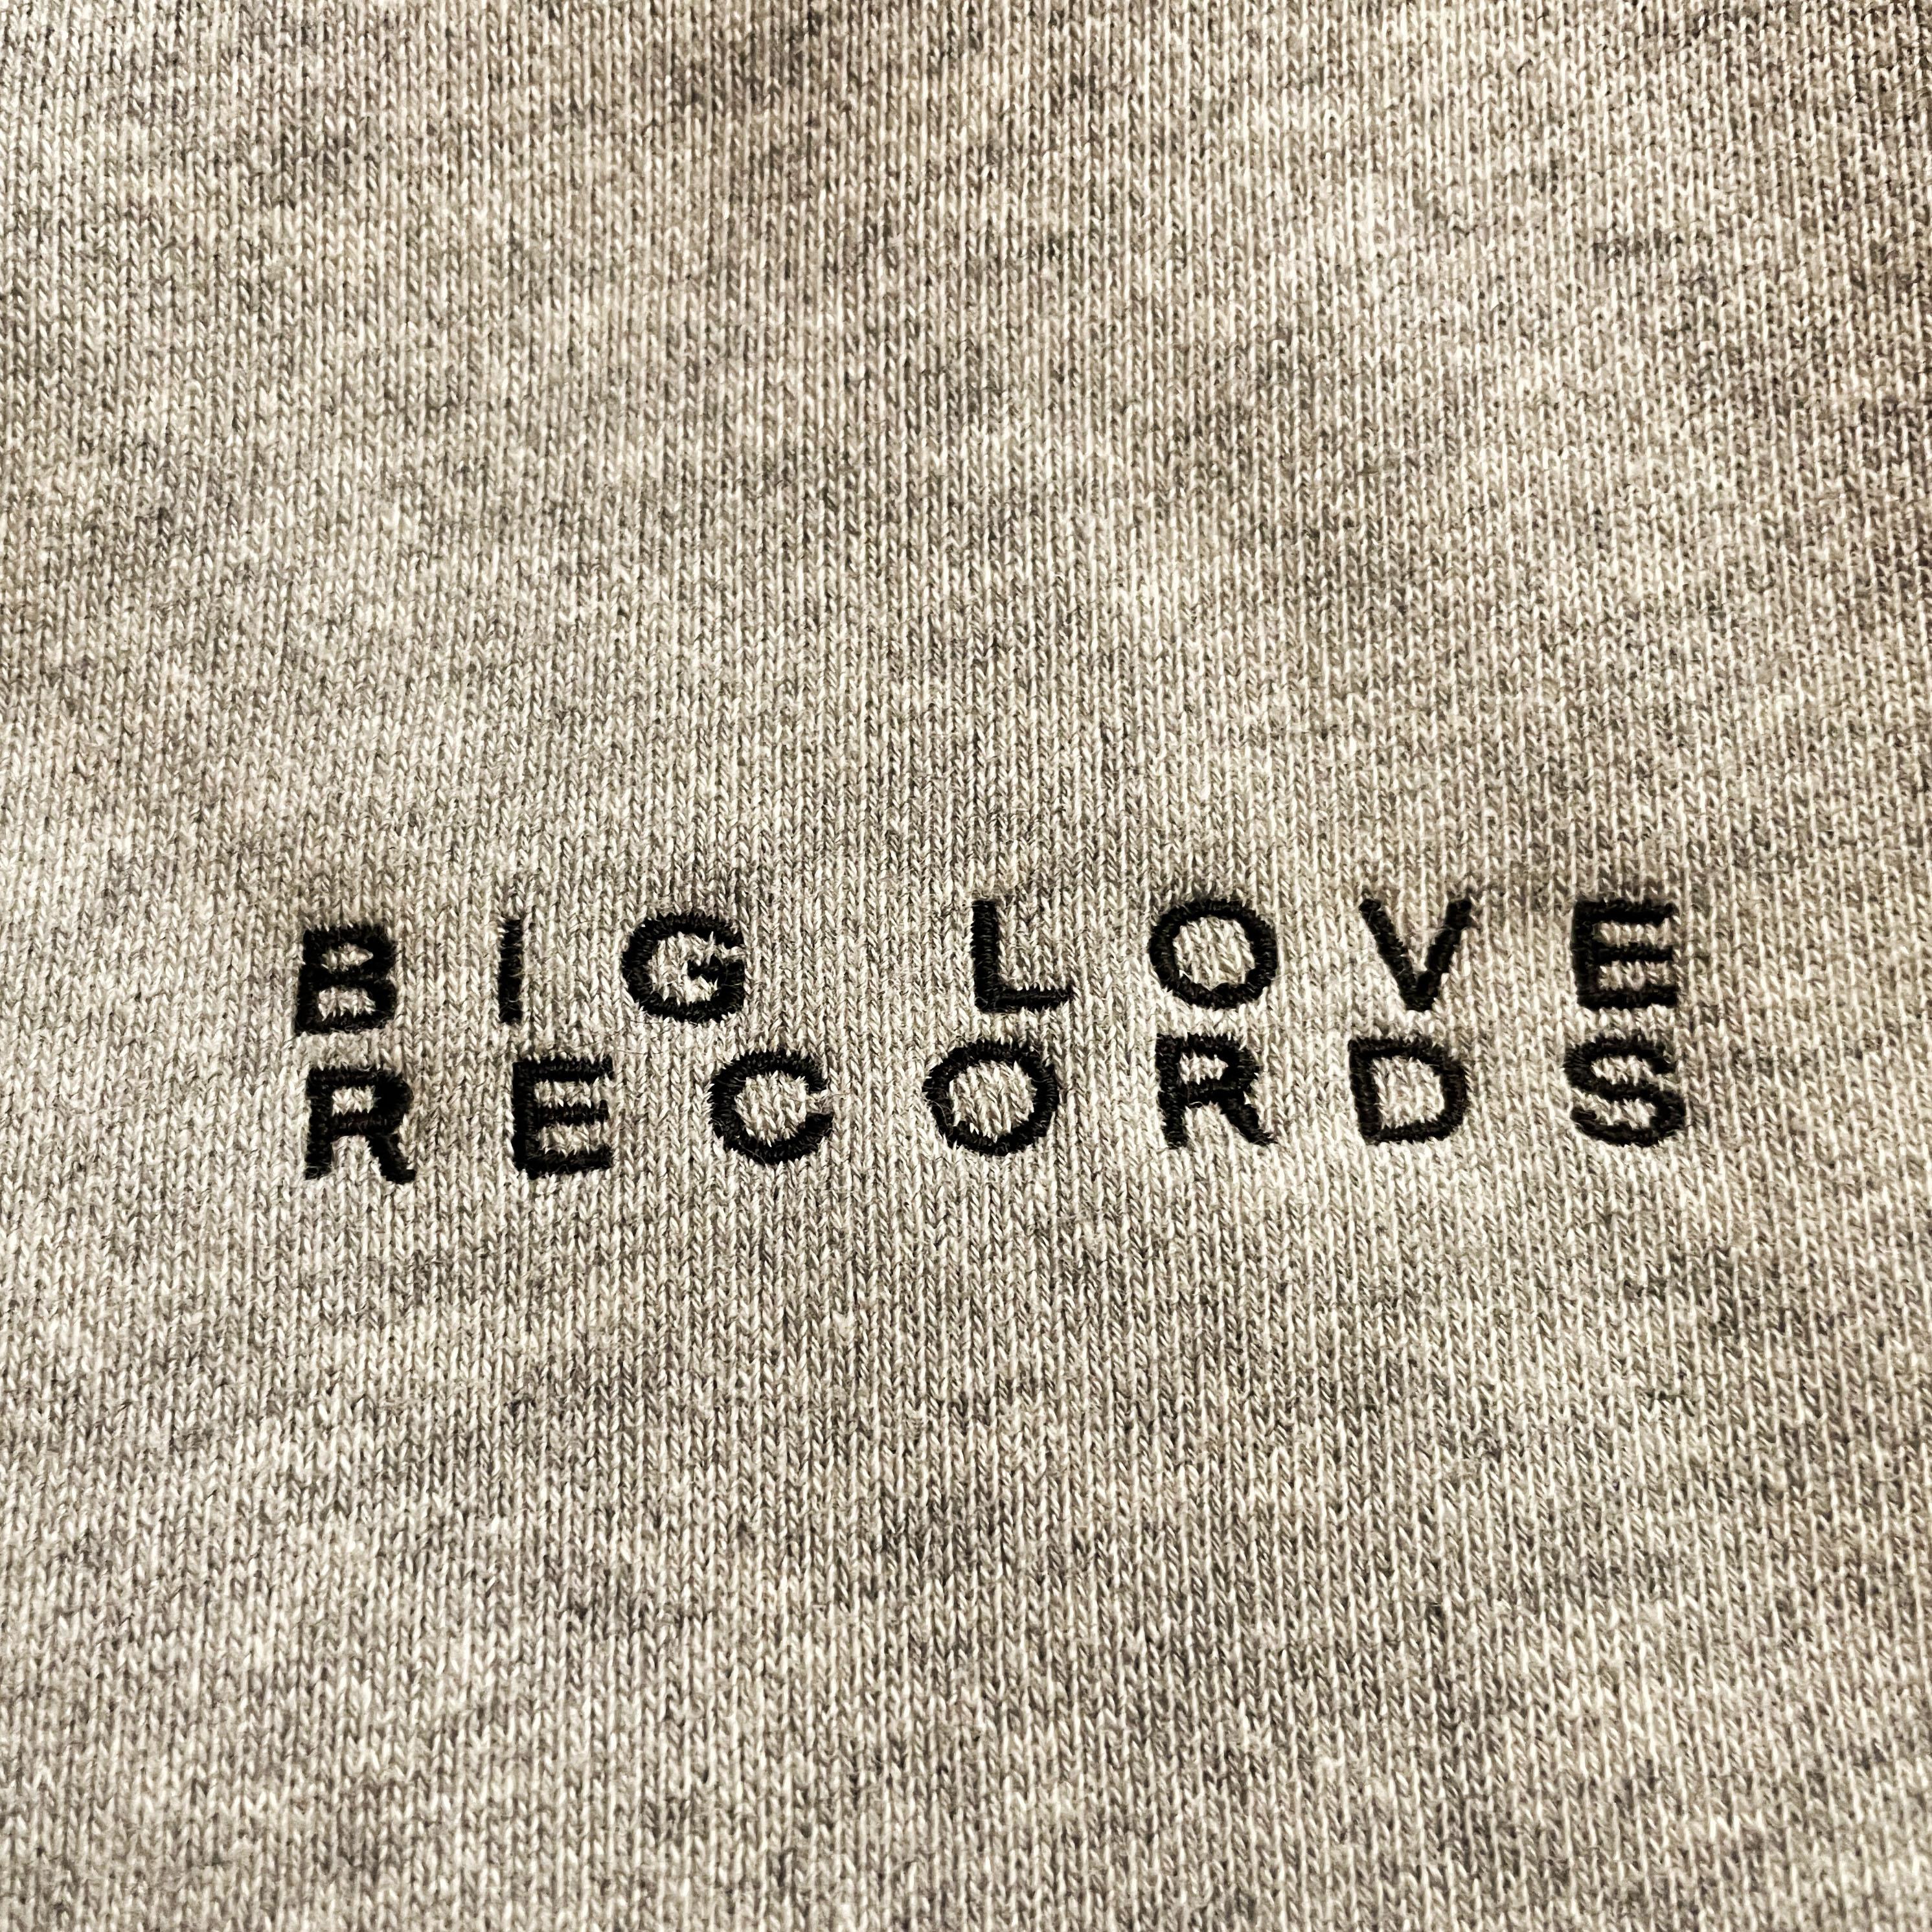 blr-grey-embroidery-2.jpg